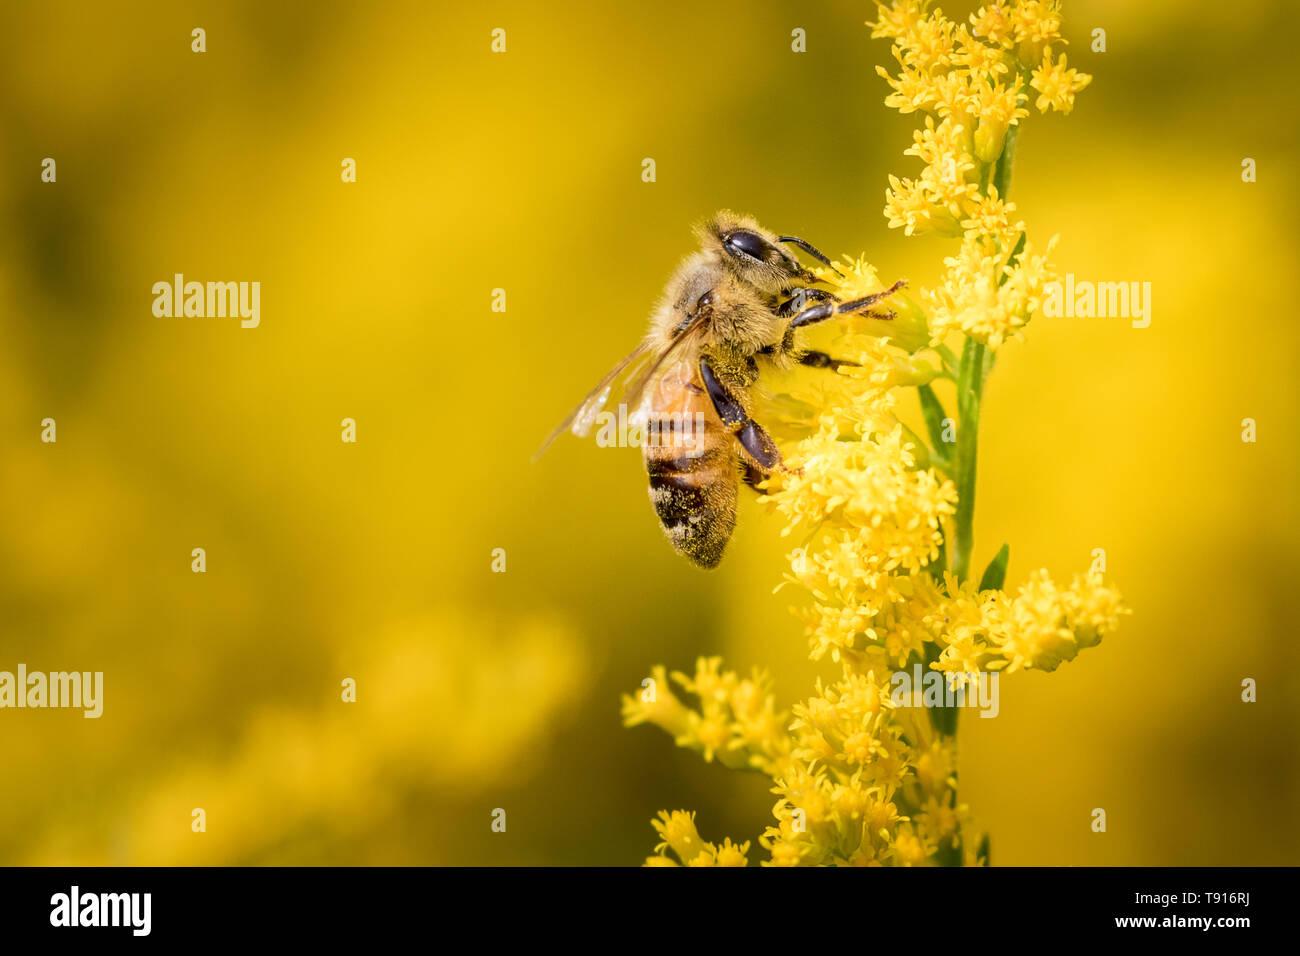 Western Honey Bee or European Honey Bee (Apis mellifera) on Goldenrod, Toronto, Ontario Canada - Honey Bees are important pollinators and honey makers - Stock Image